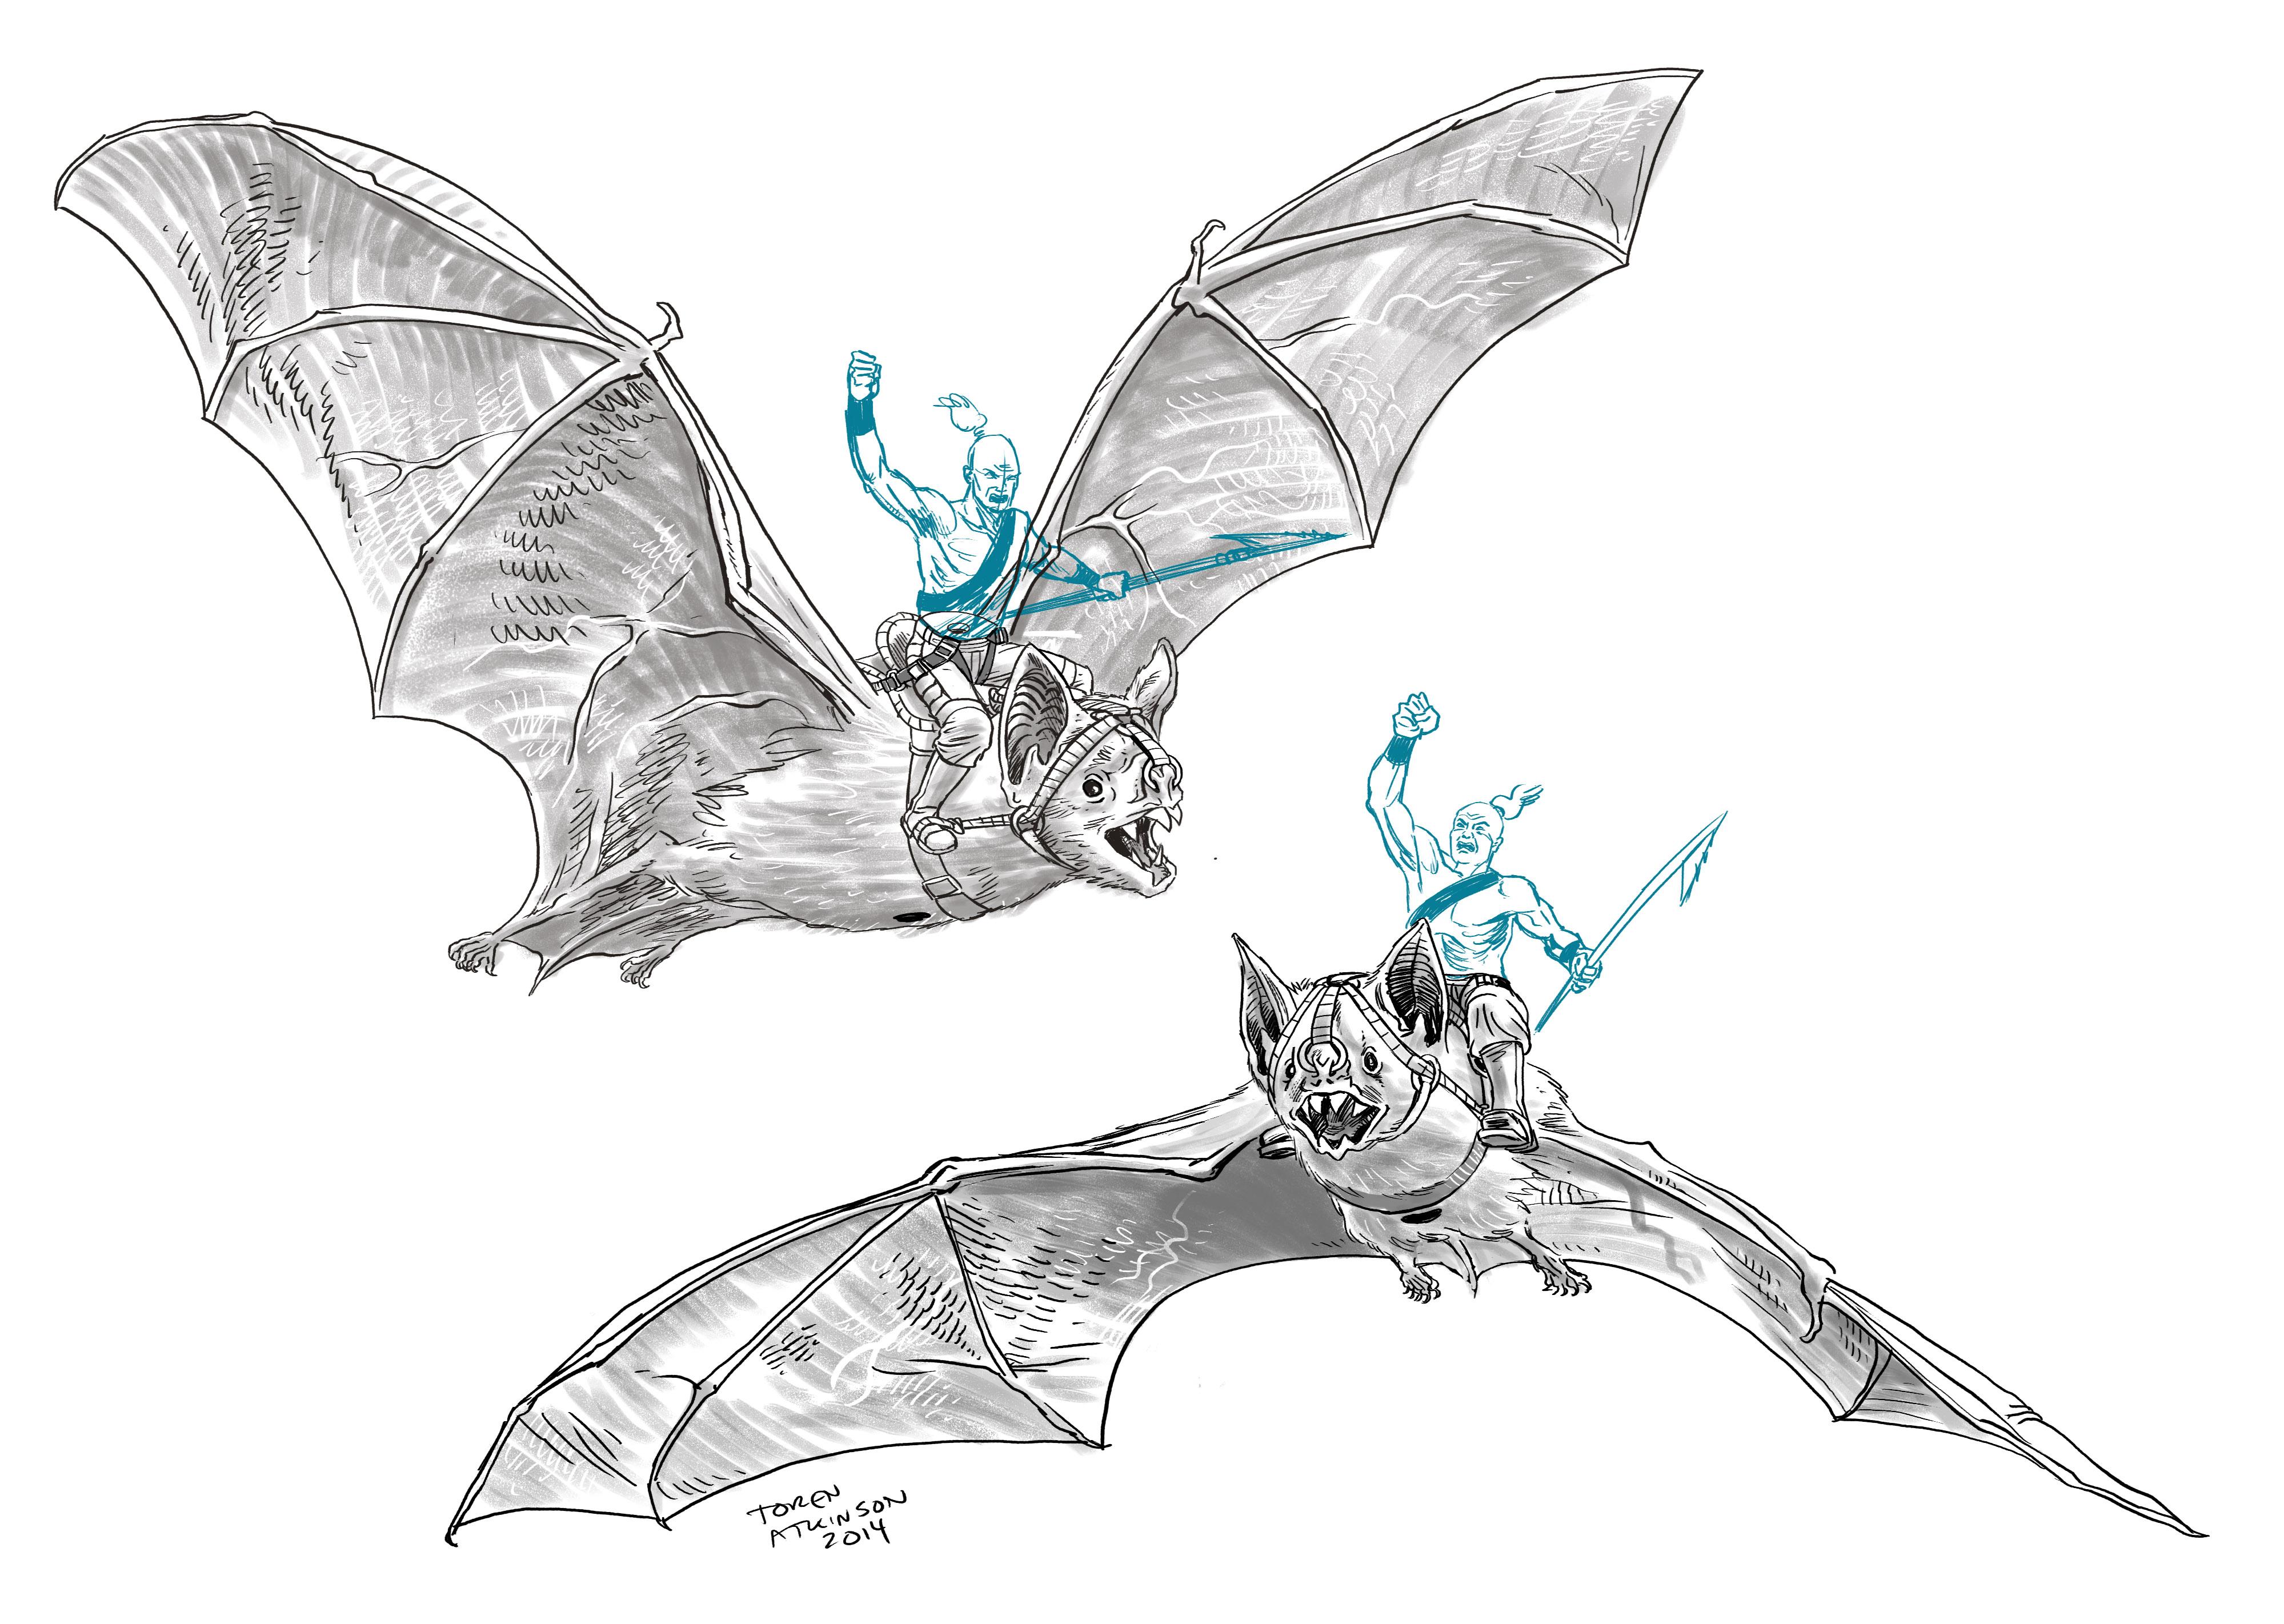 New Miniature Design: Bat-Rider – Toren Atkinson on